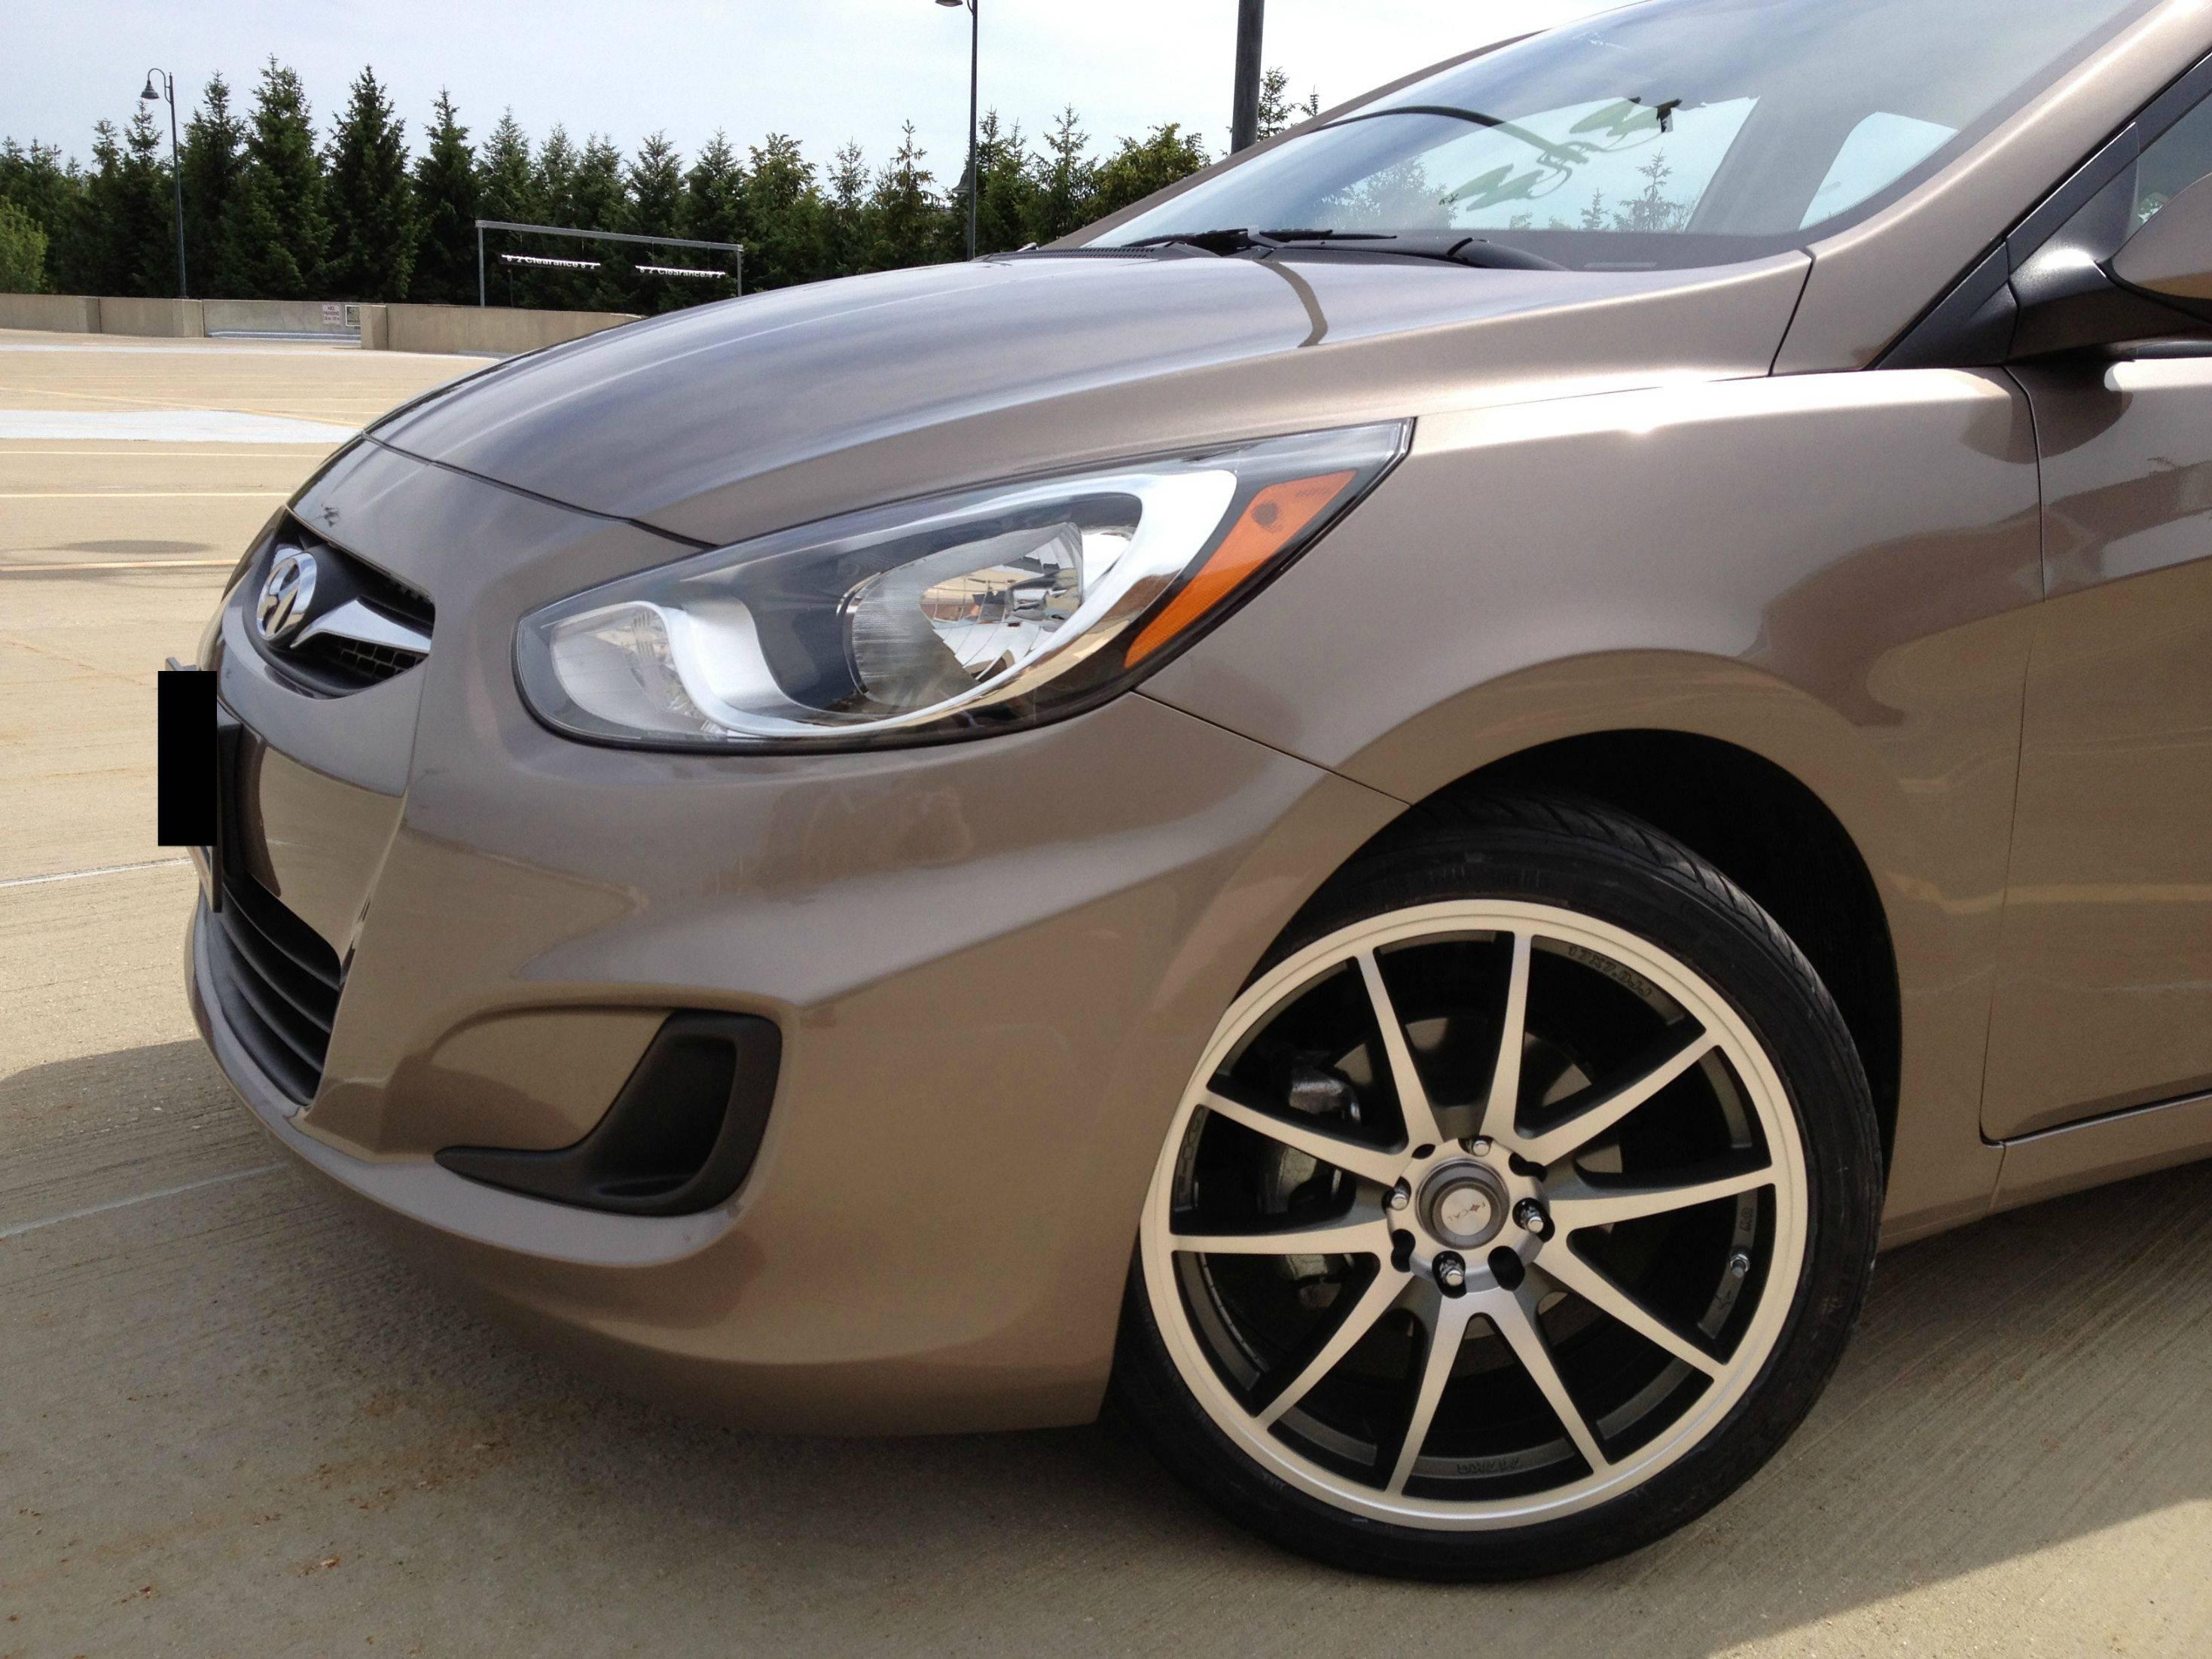 Hyundai Accent Custom Wheels Focal F10 17x7 0 Et Tire Size 205 40